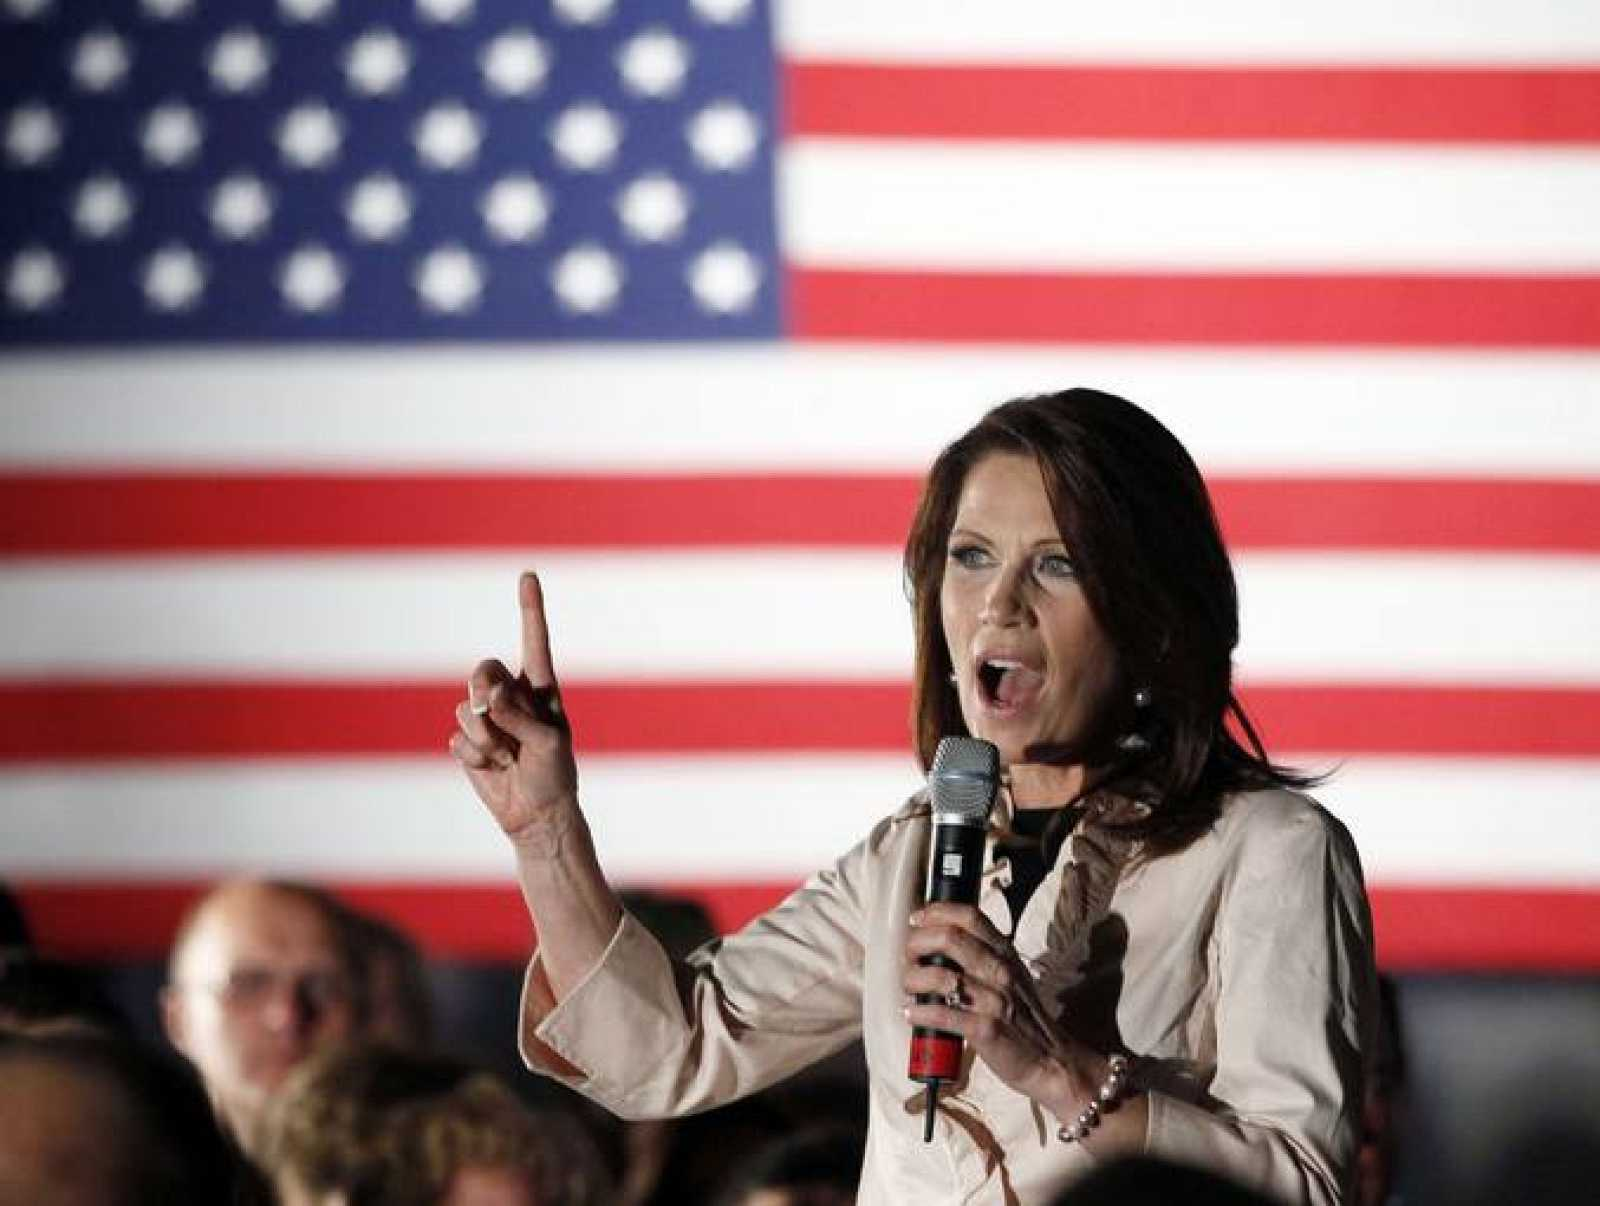 La congresista Bachmann, durante un mitin en Iowa.